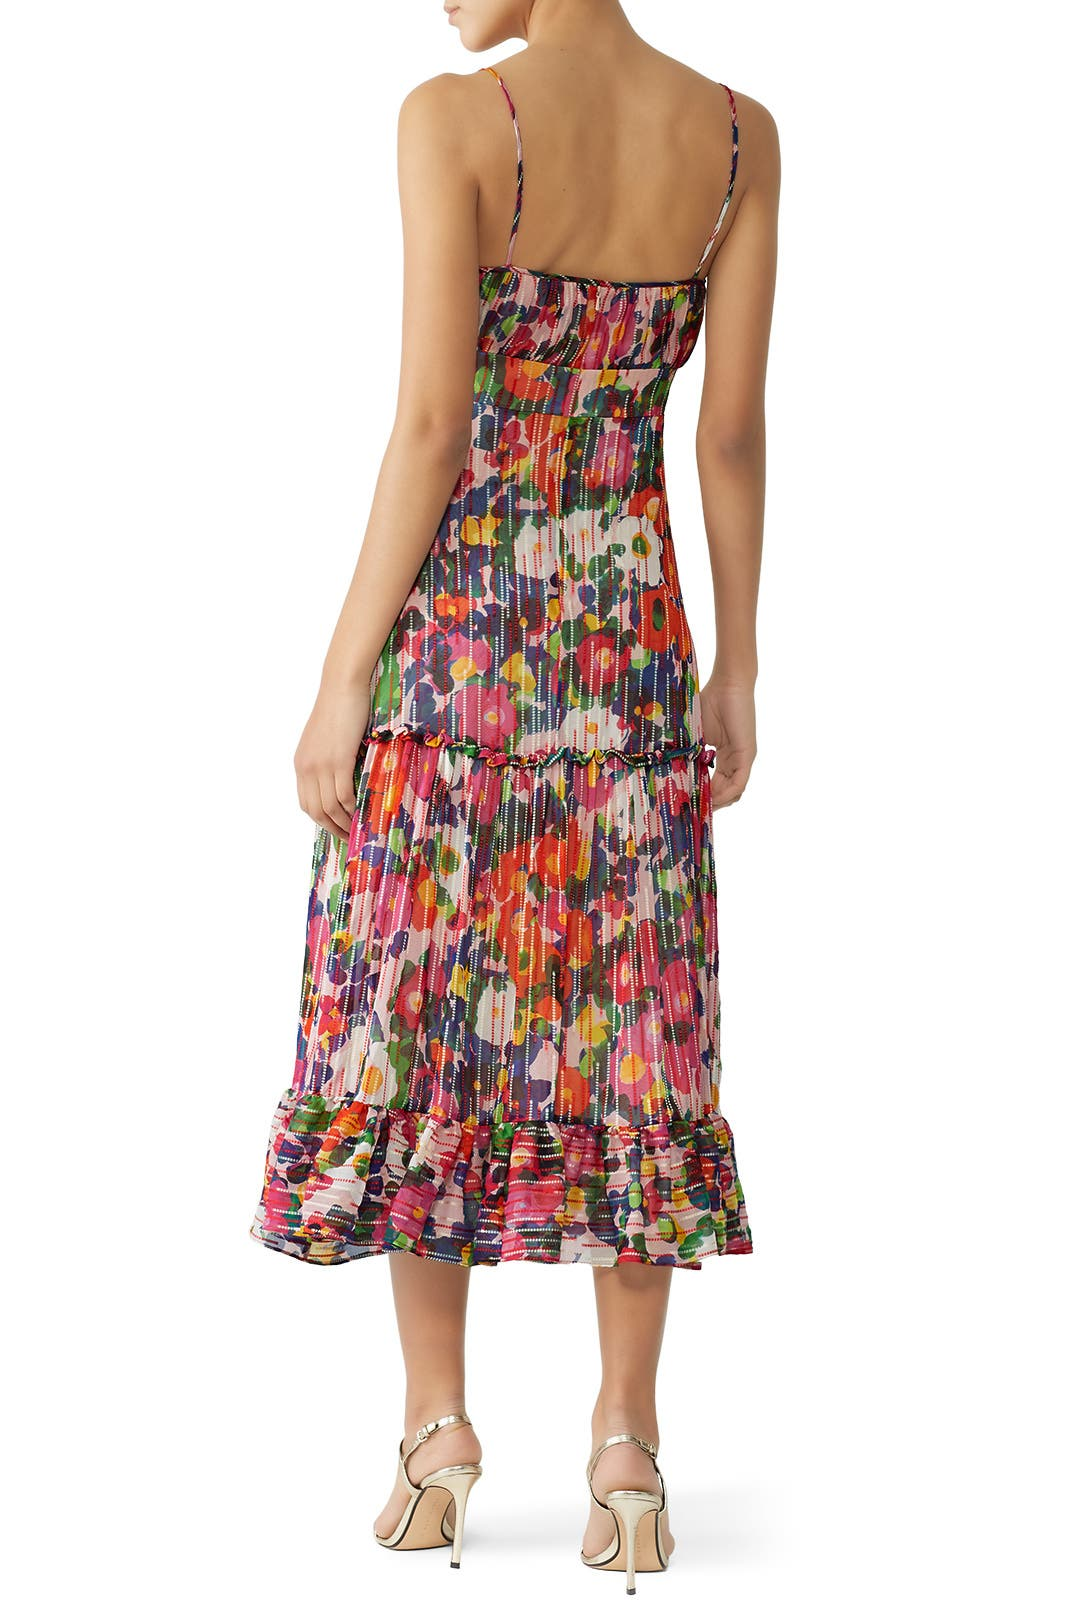 c6ca208da957 Bella Dress by SALONI for $100 - $110   Rent the Runway